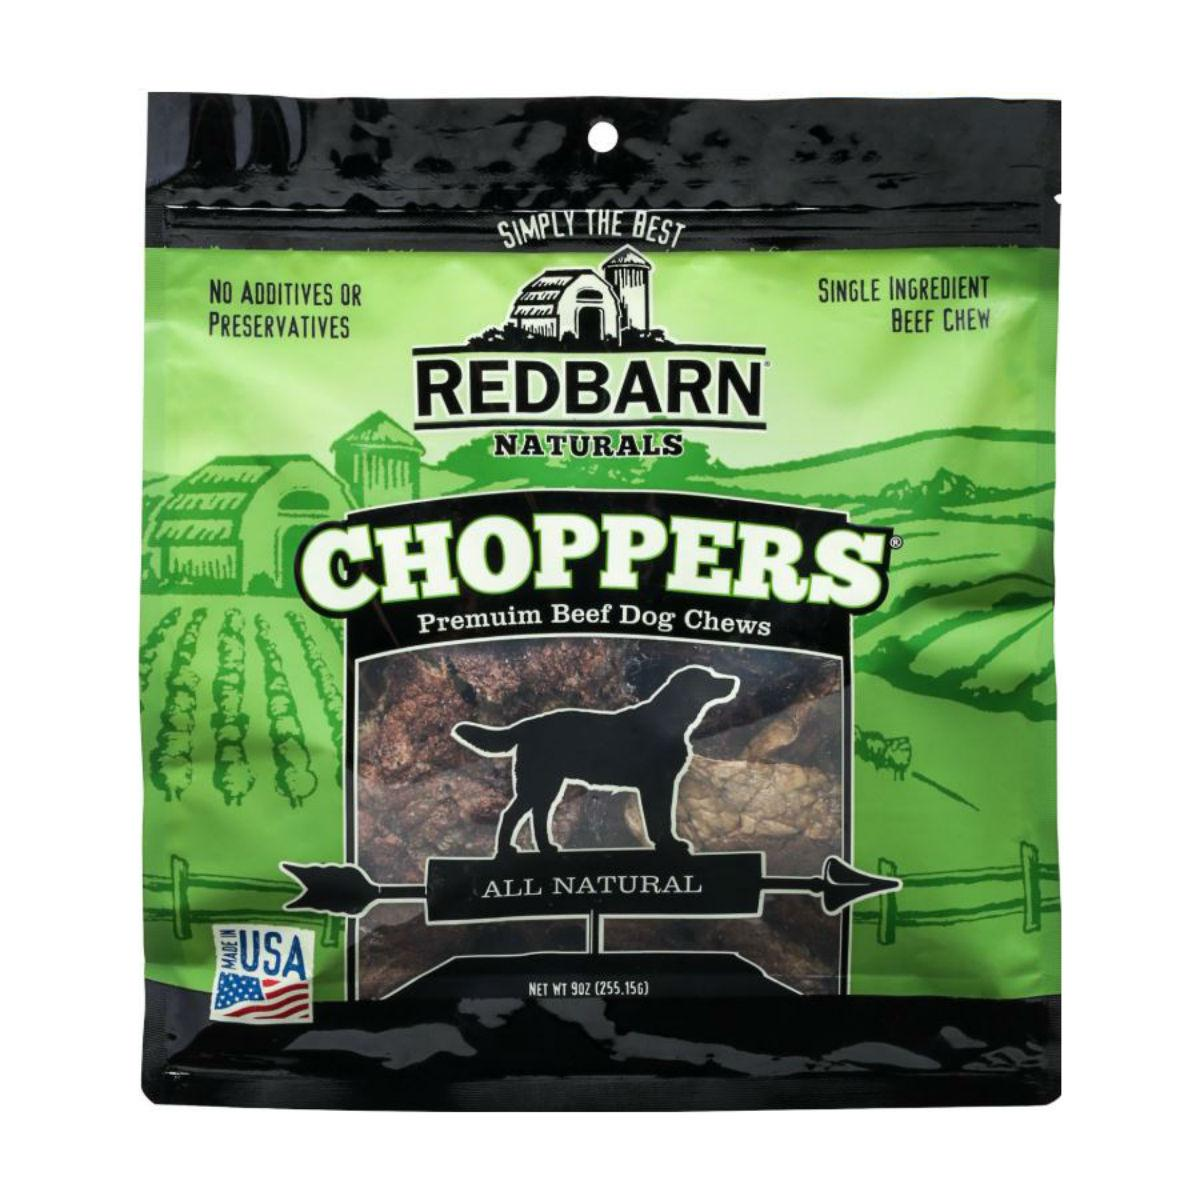 Redbarn Naturals Choppers Beef Dog Treats